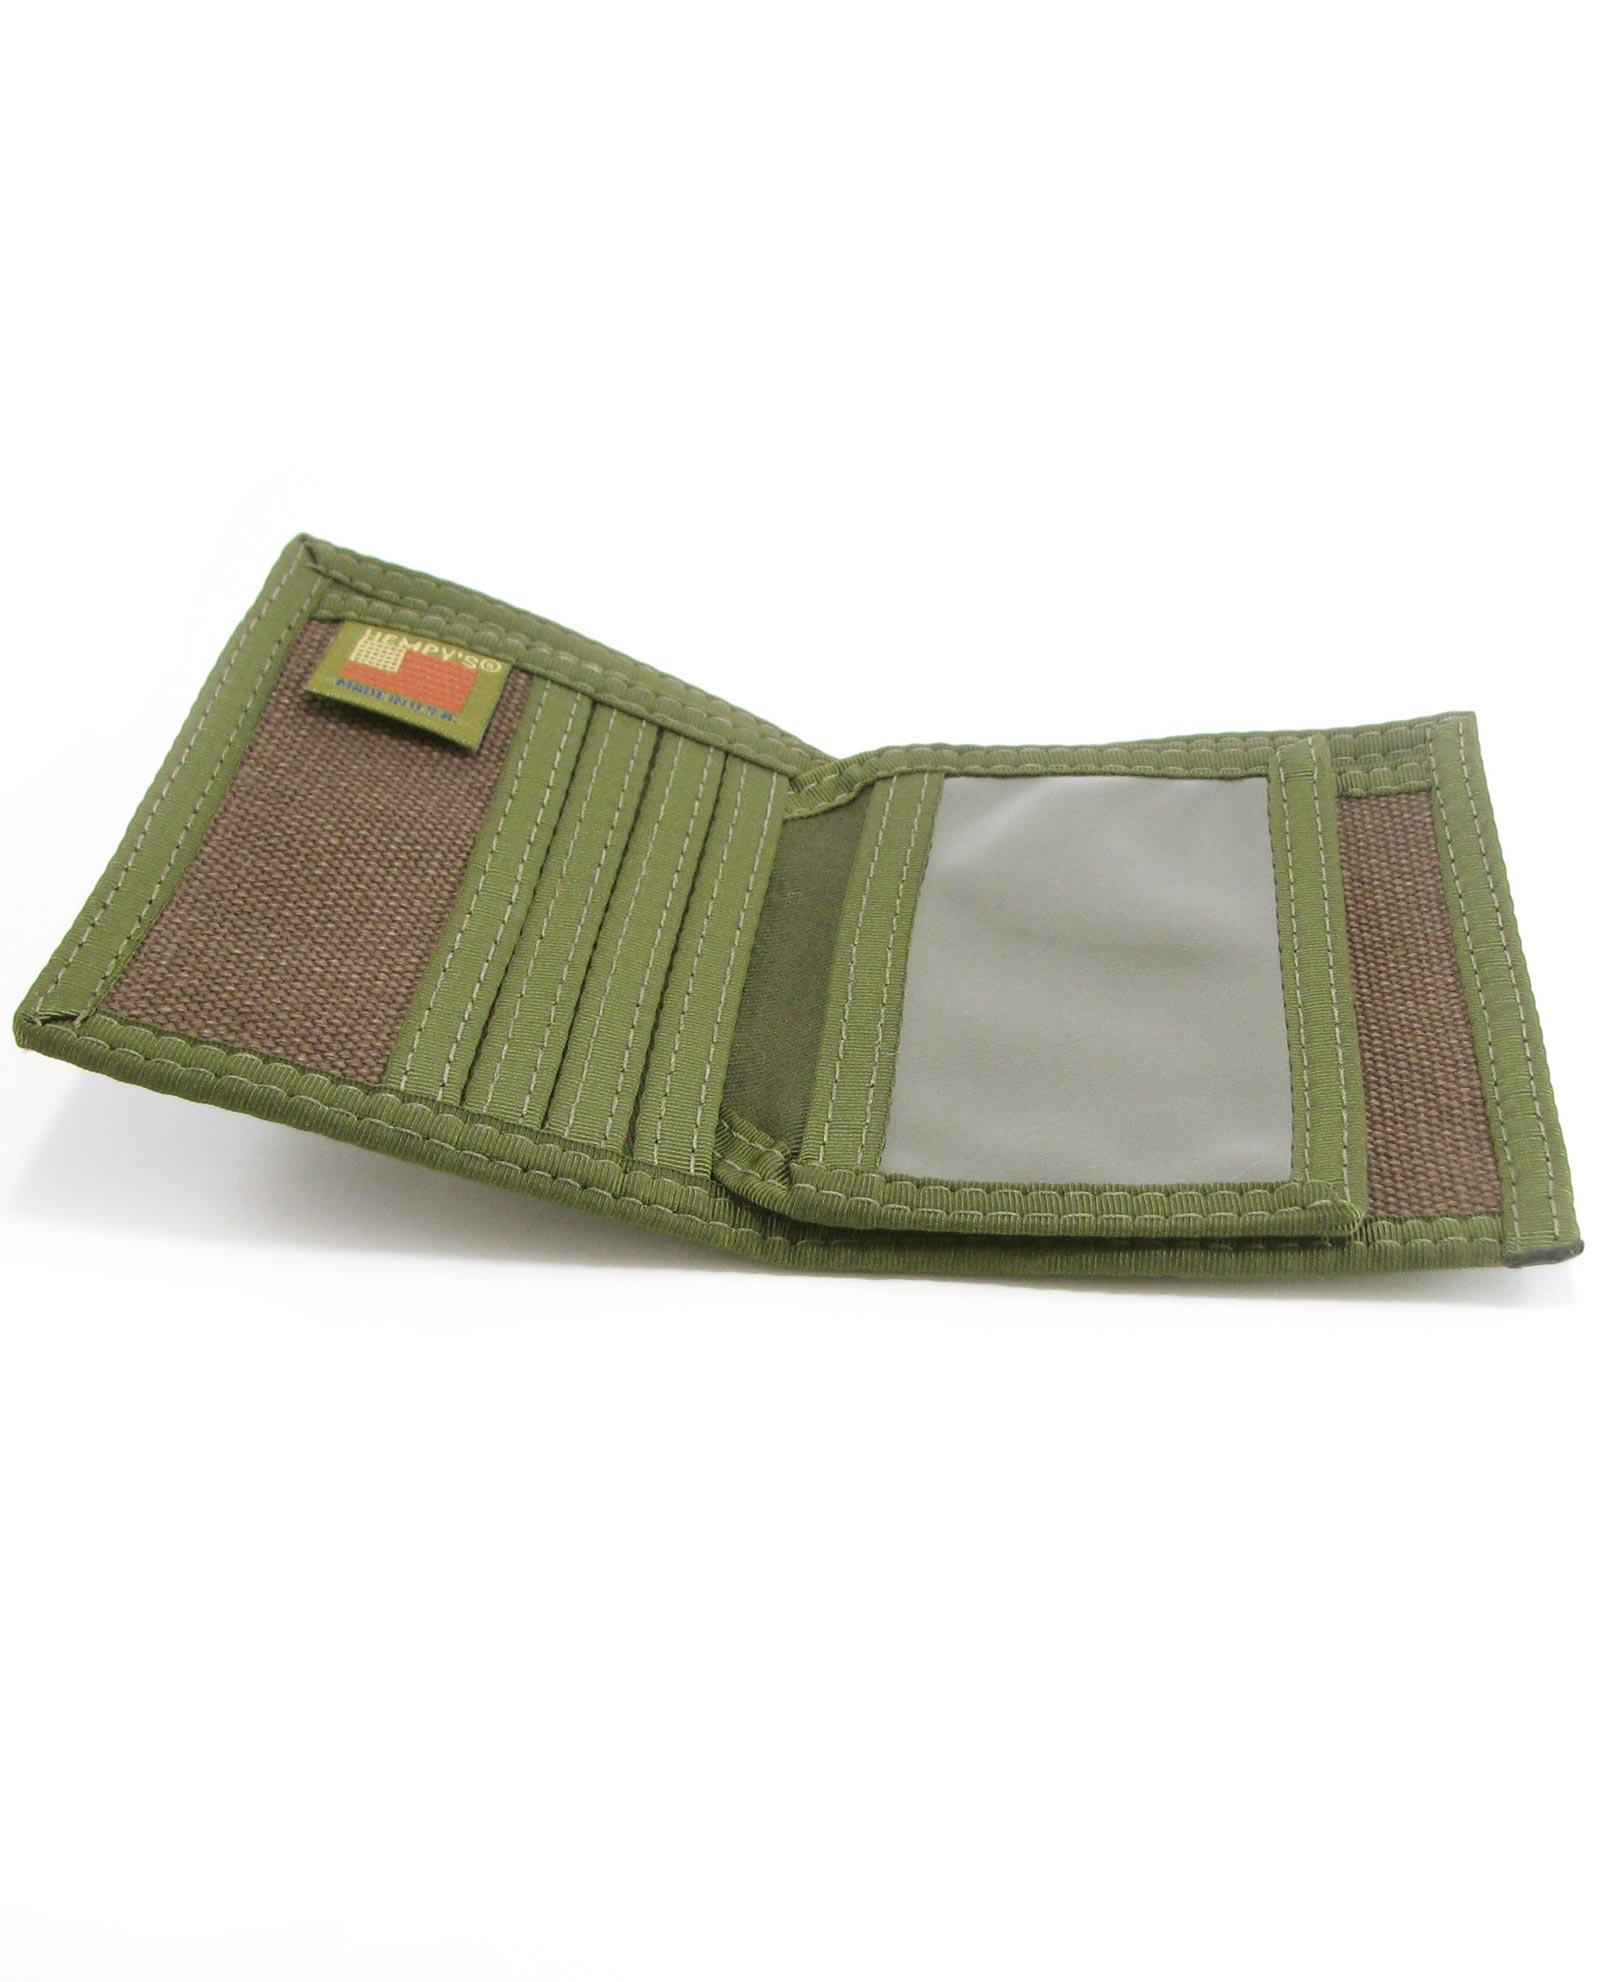 Home gt shop gt hemp wallets gt bifold gt hemp bi fold wallet brown with